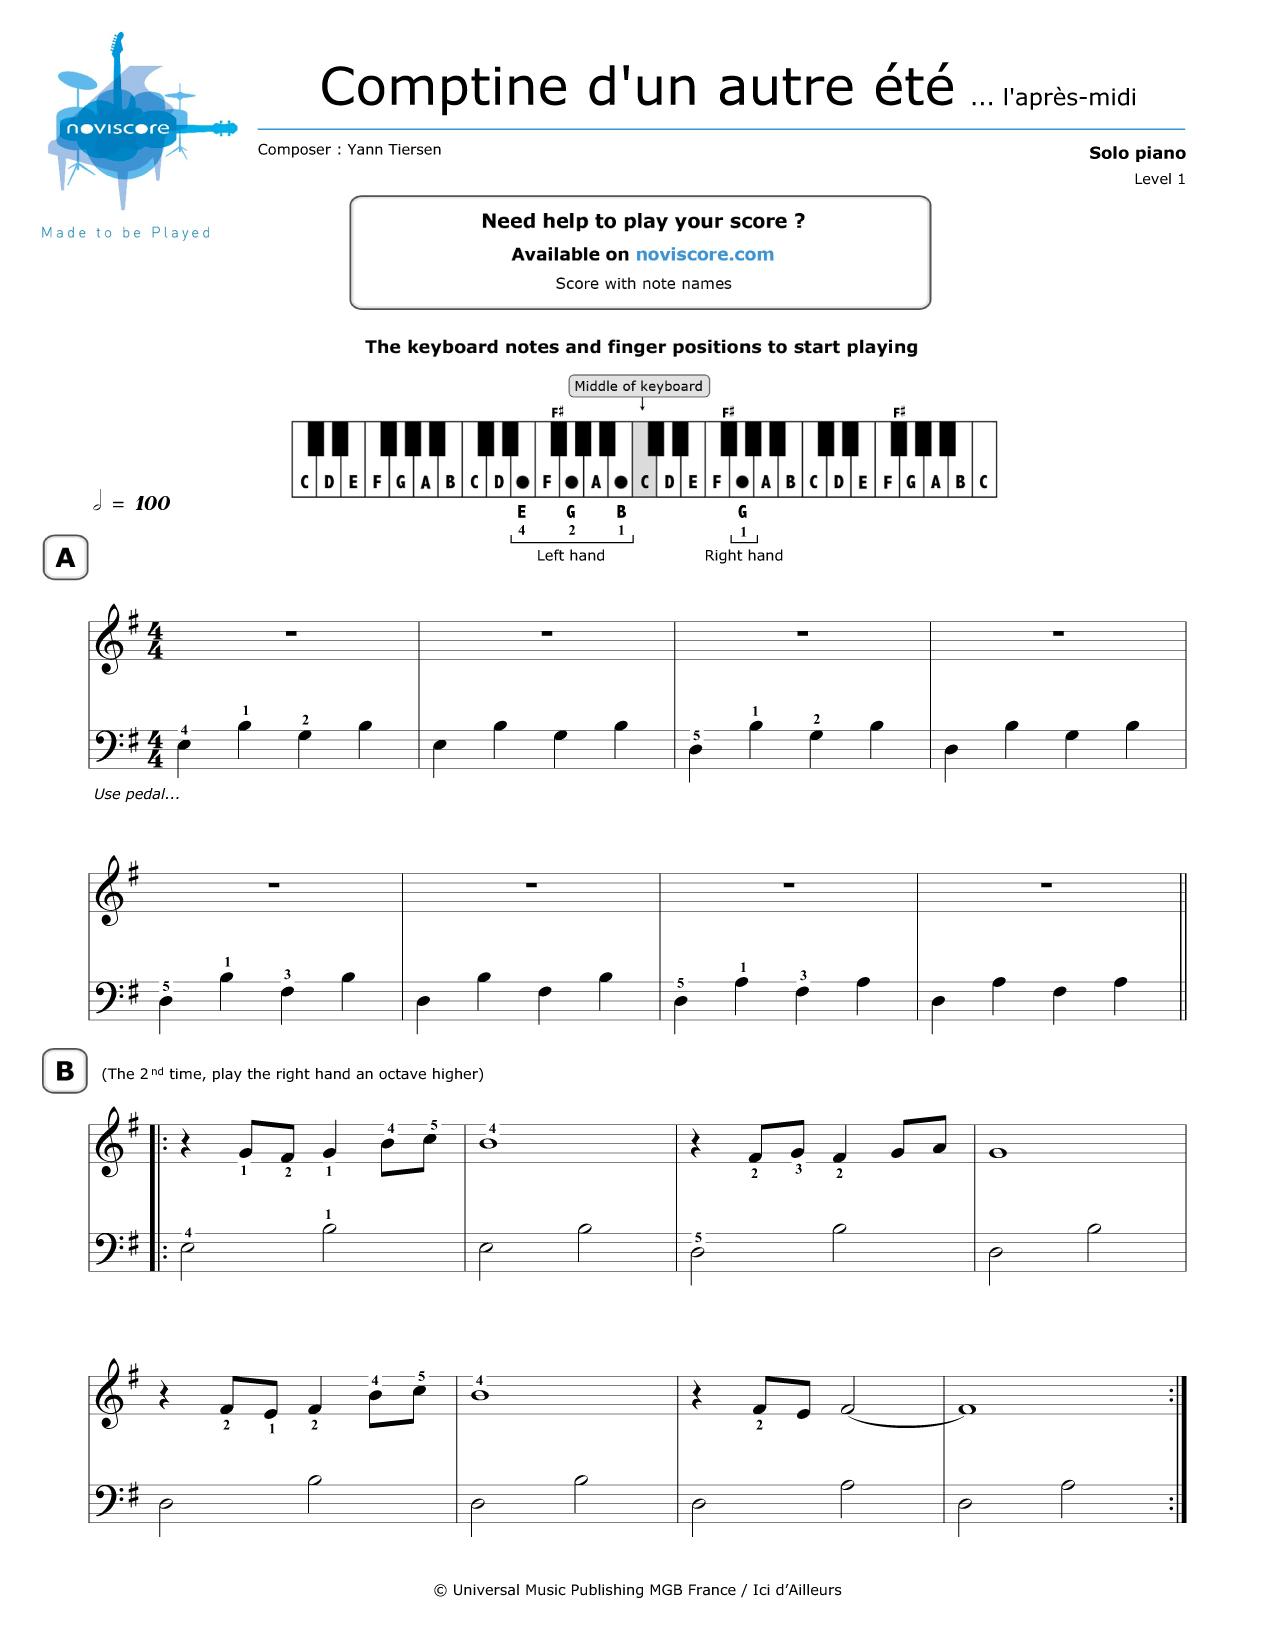 Piano Sheet Music Comptine Dun Autre été Yann Tiersen